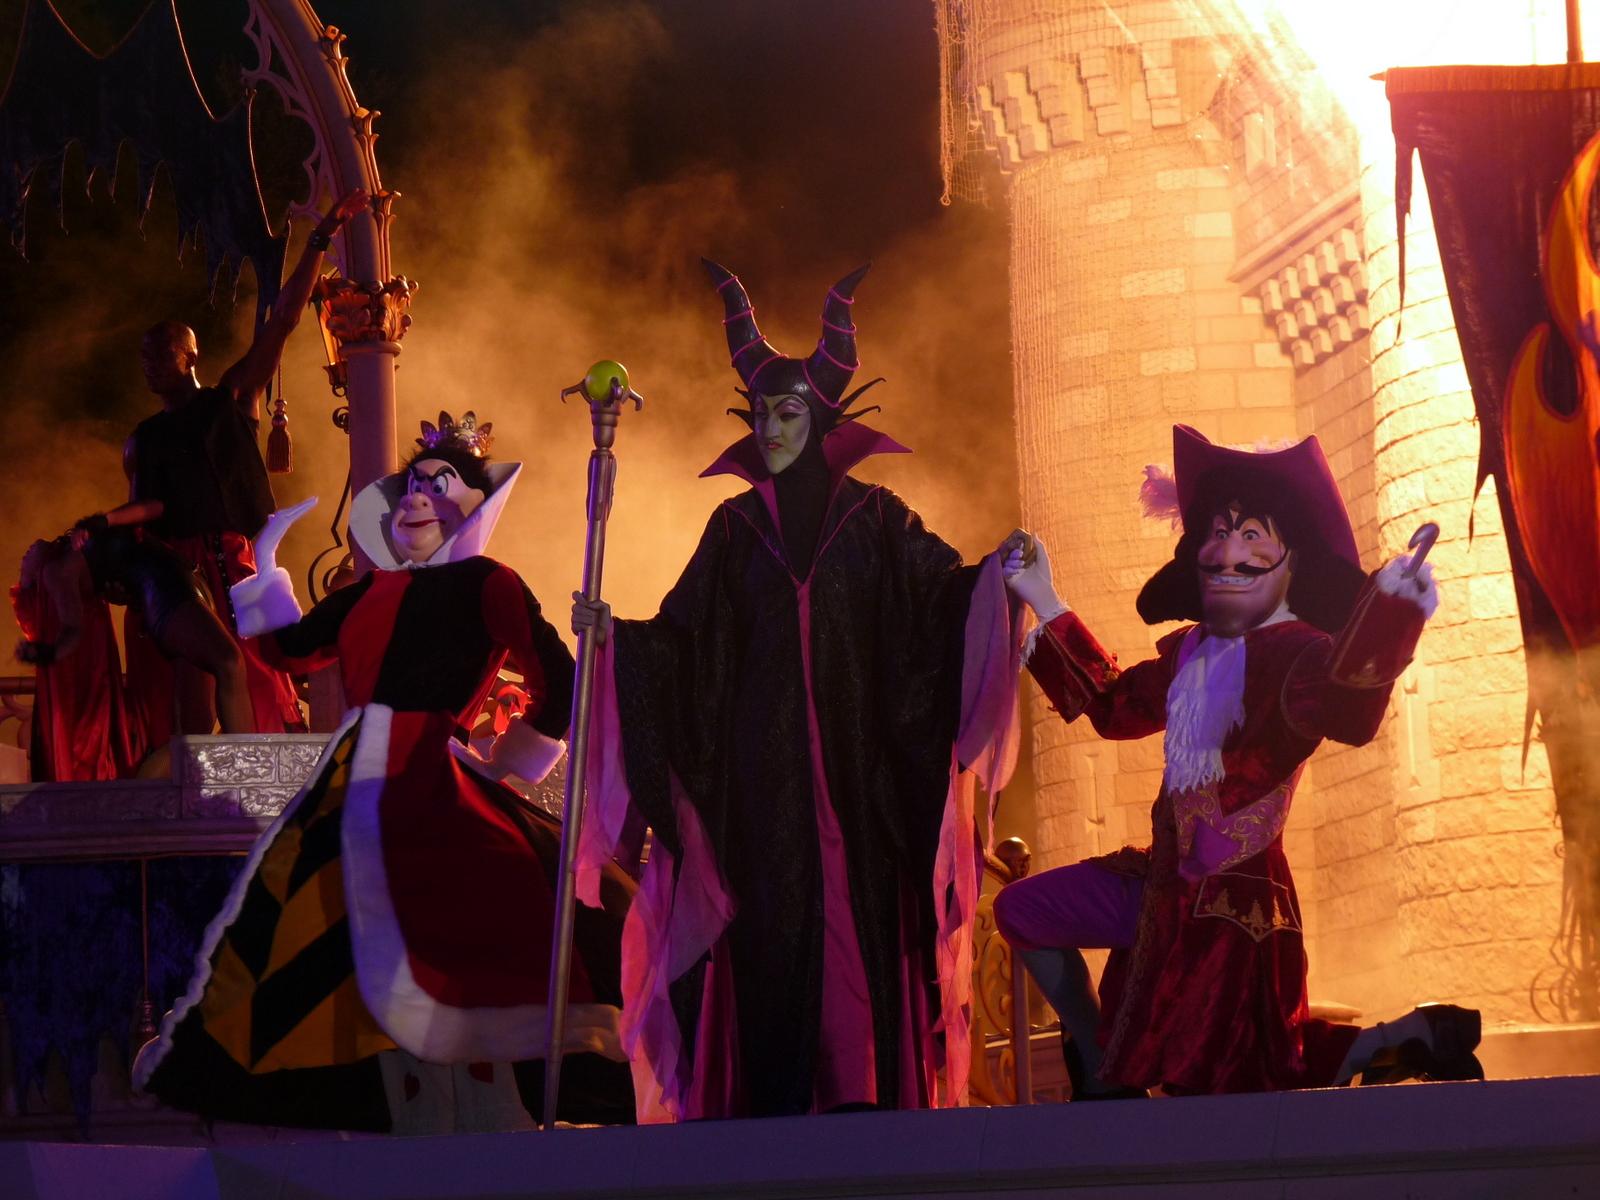 Halloween Disney Villains.File Disney Villains At Mickey S Not So Scary Halloween Party 2009